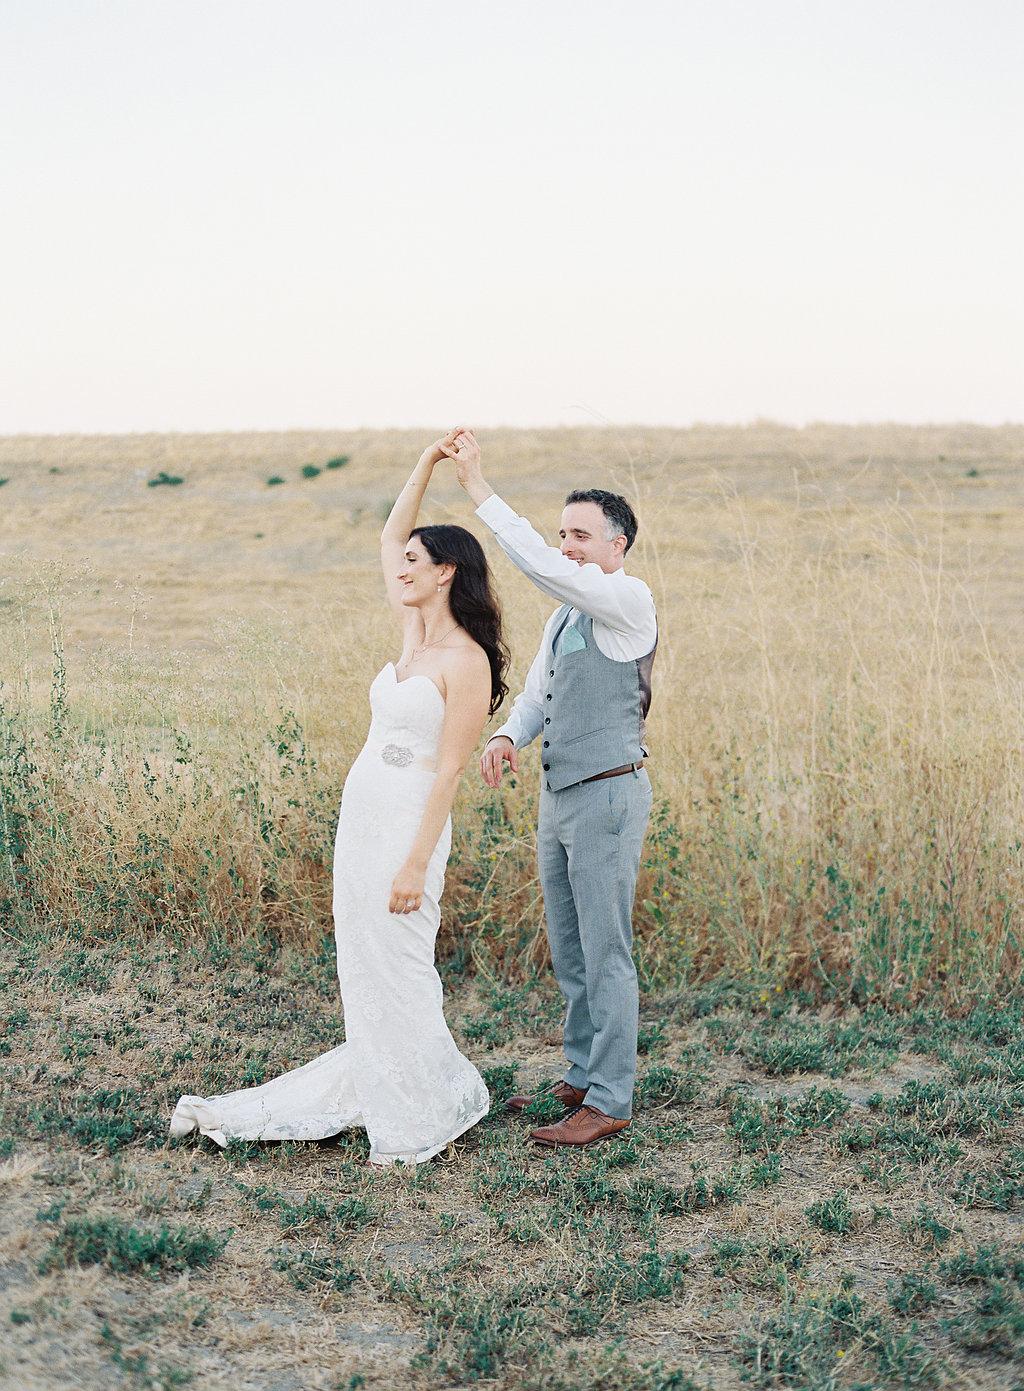 Meghan Mehan Photography - California Wedding Photography - Sacramento Wedding 025.jpg